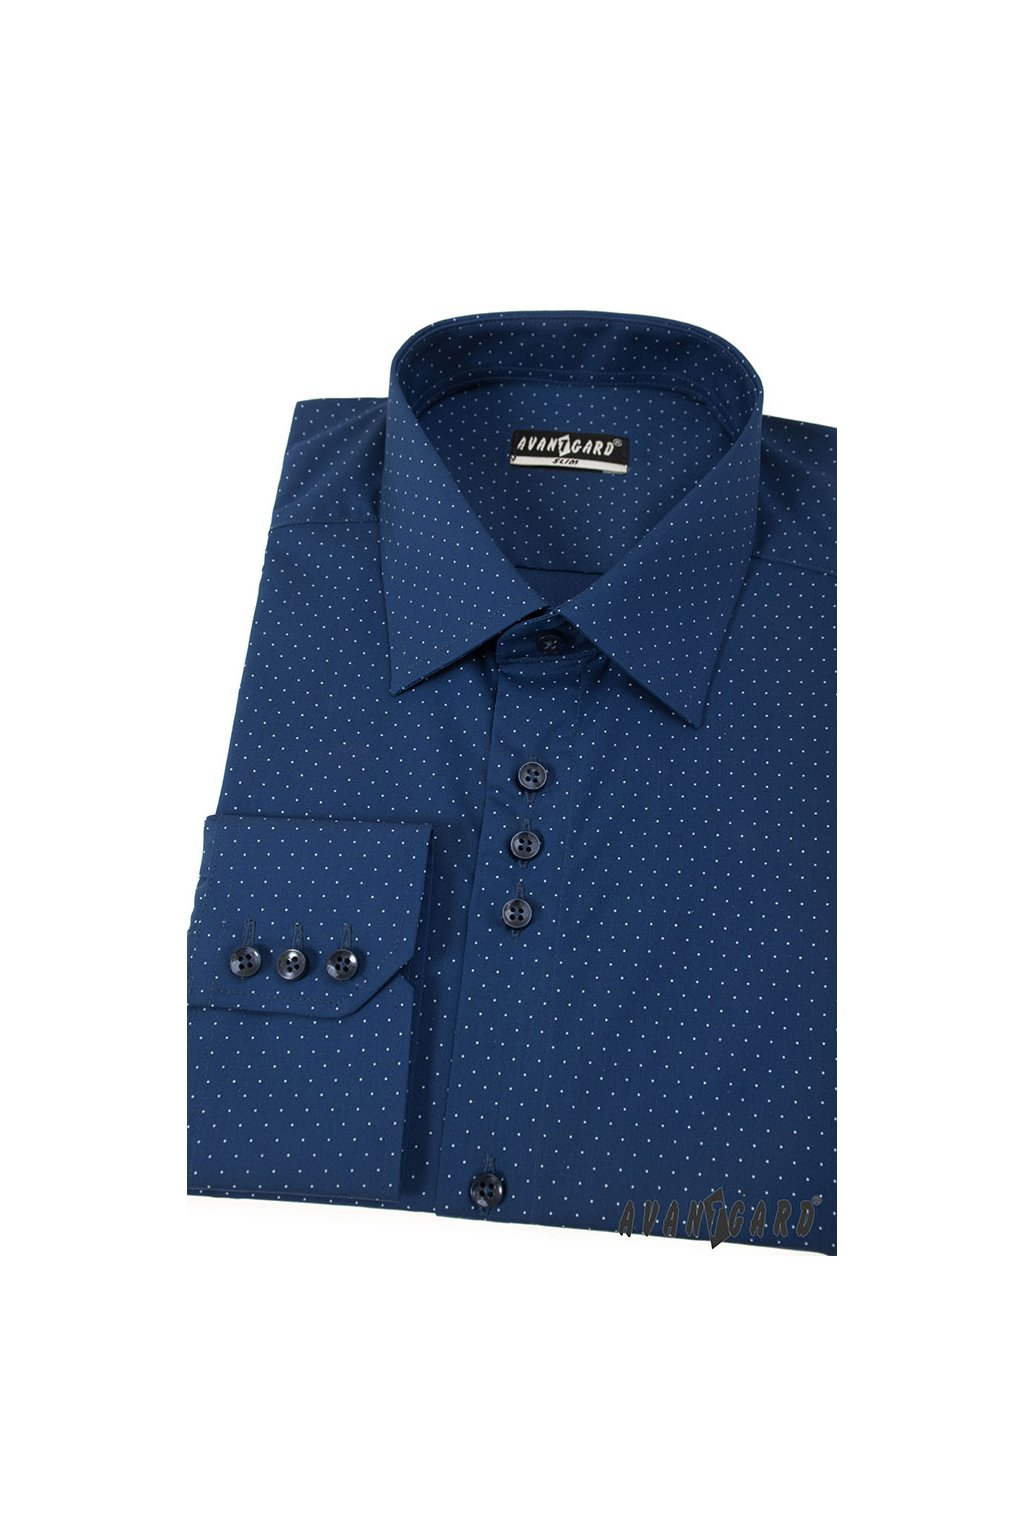 Pánská košile SLIM modrá 125 - 3111